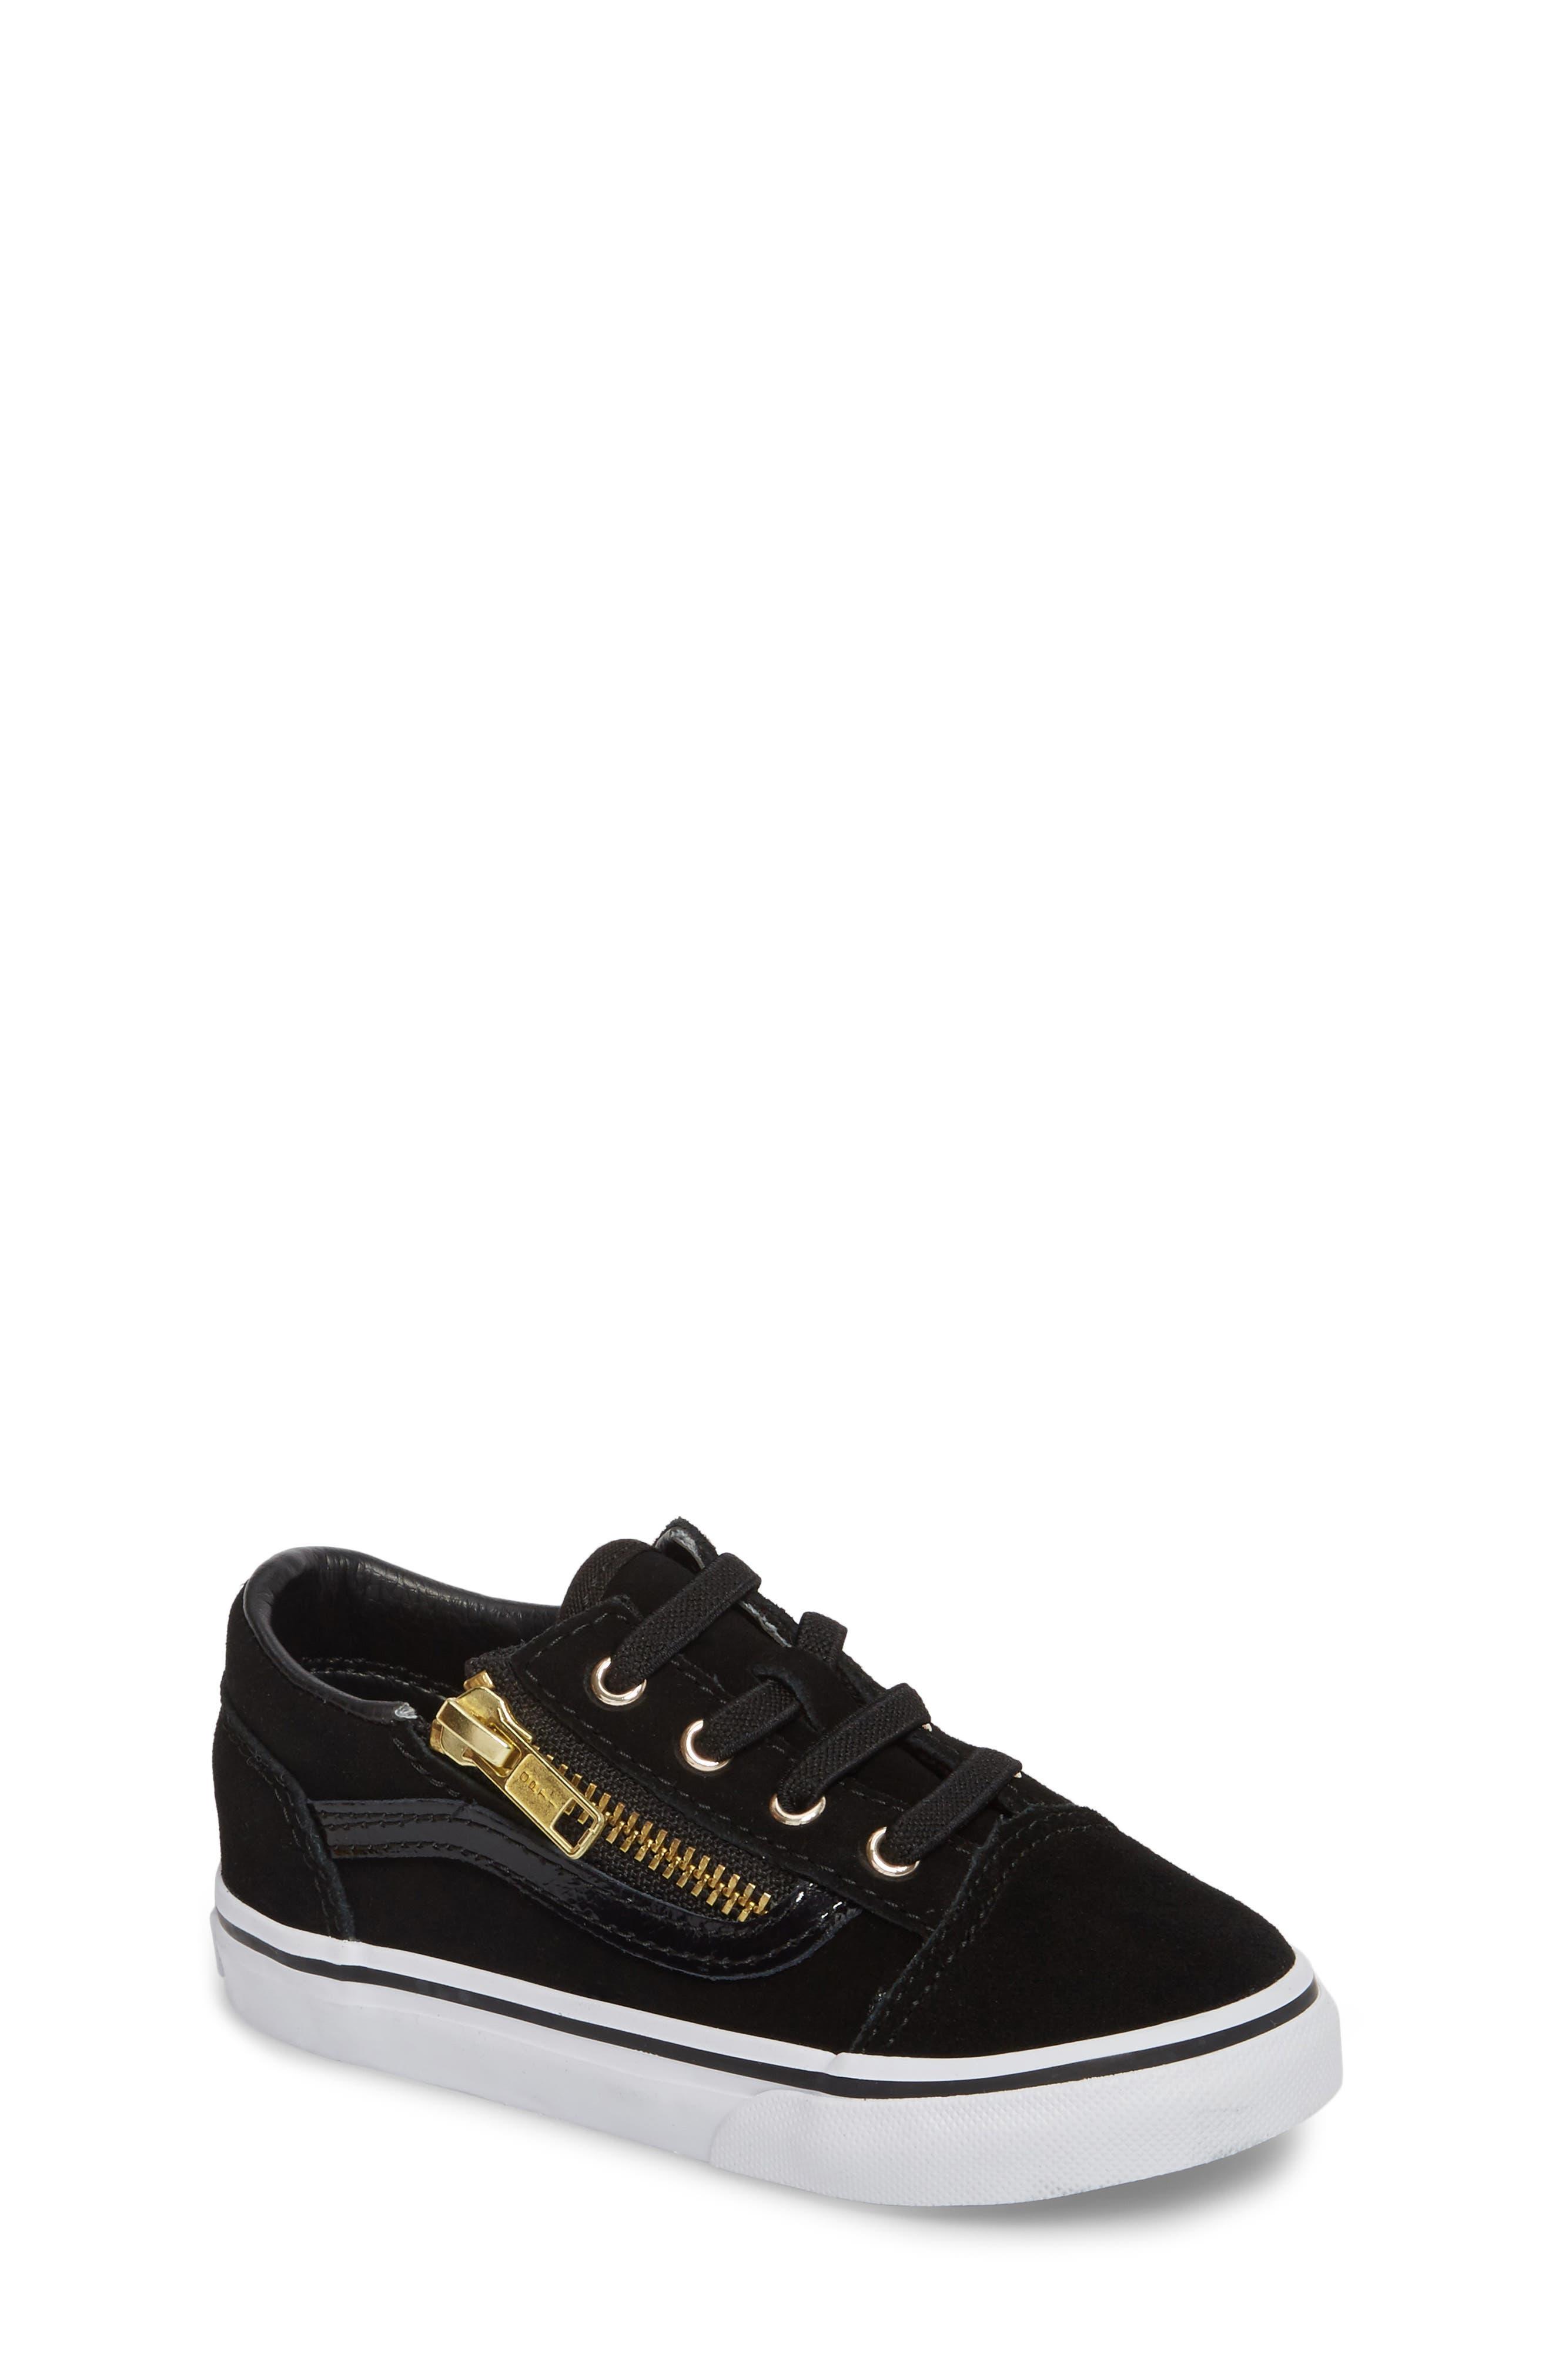 Old Skool Zip Sneaker,                             Main thumbnail 1, color,                             Black/ Gold